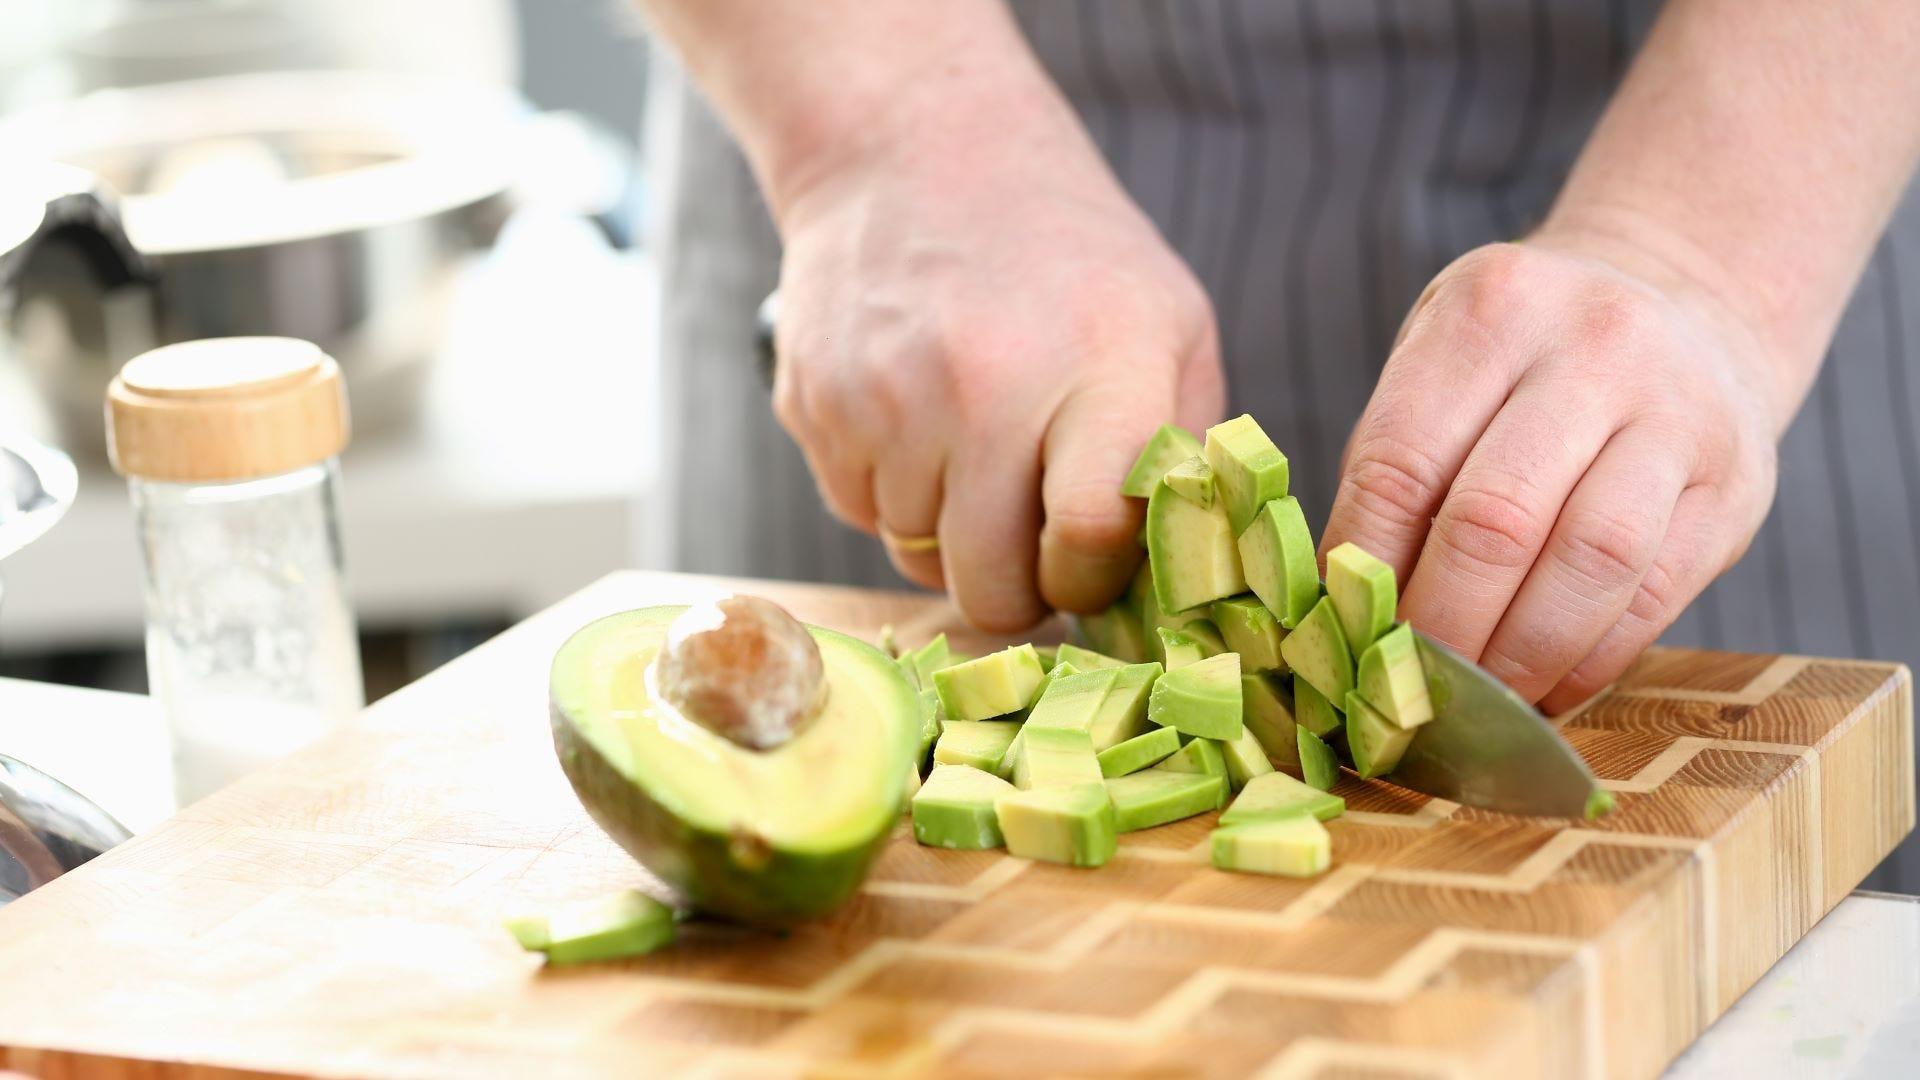 Someone slicing an avocado on a cutting board.